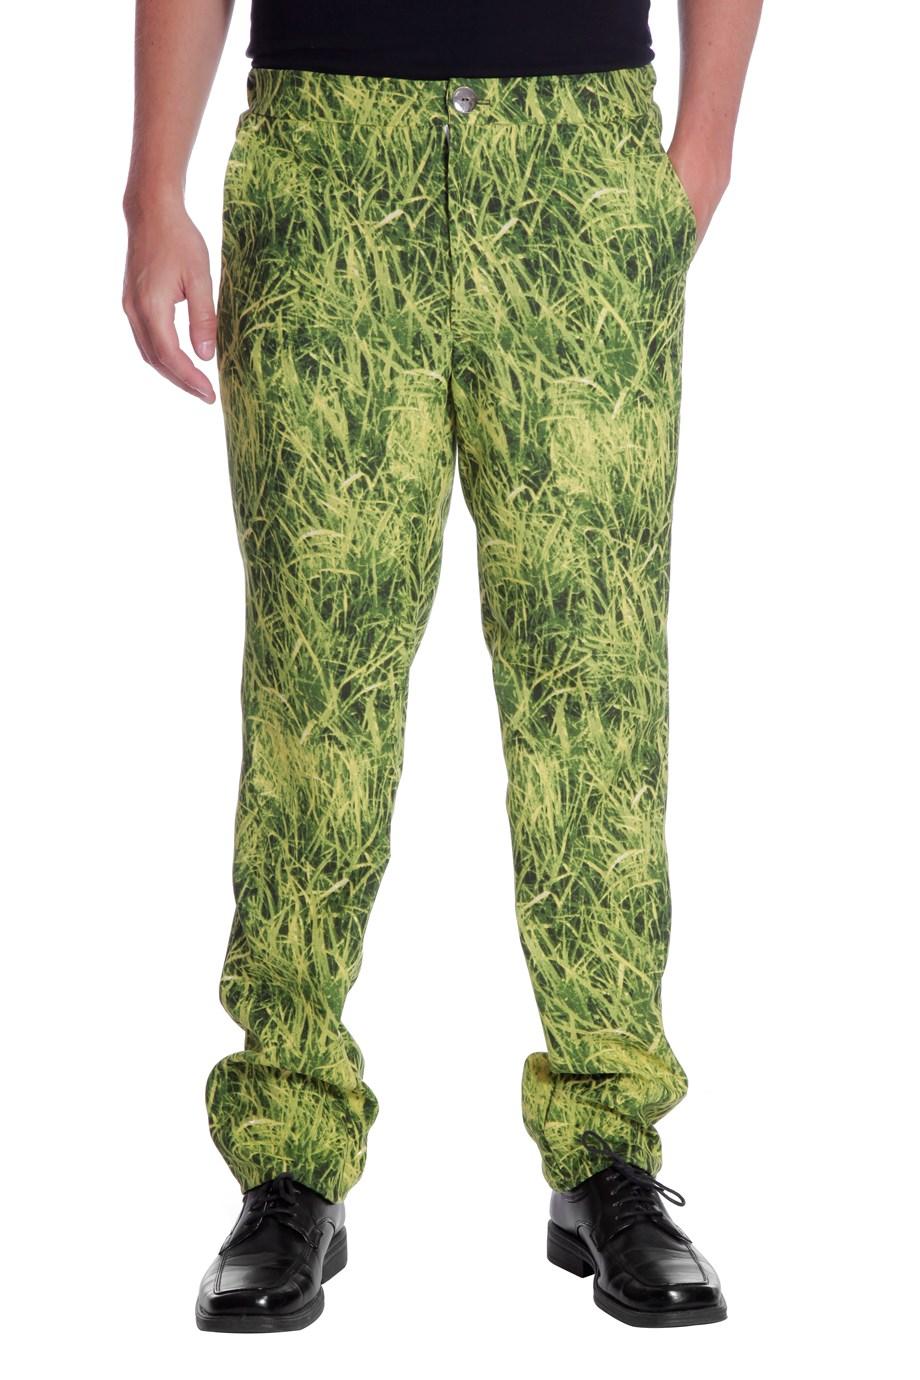 Broek multi print gras voor heer